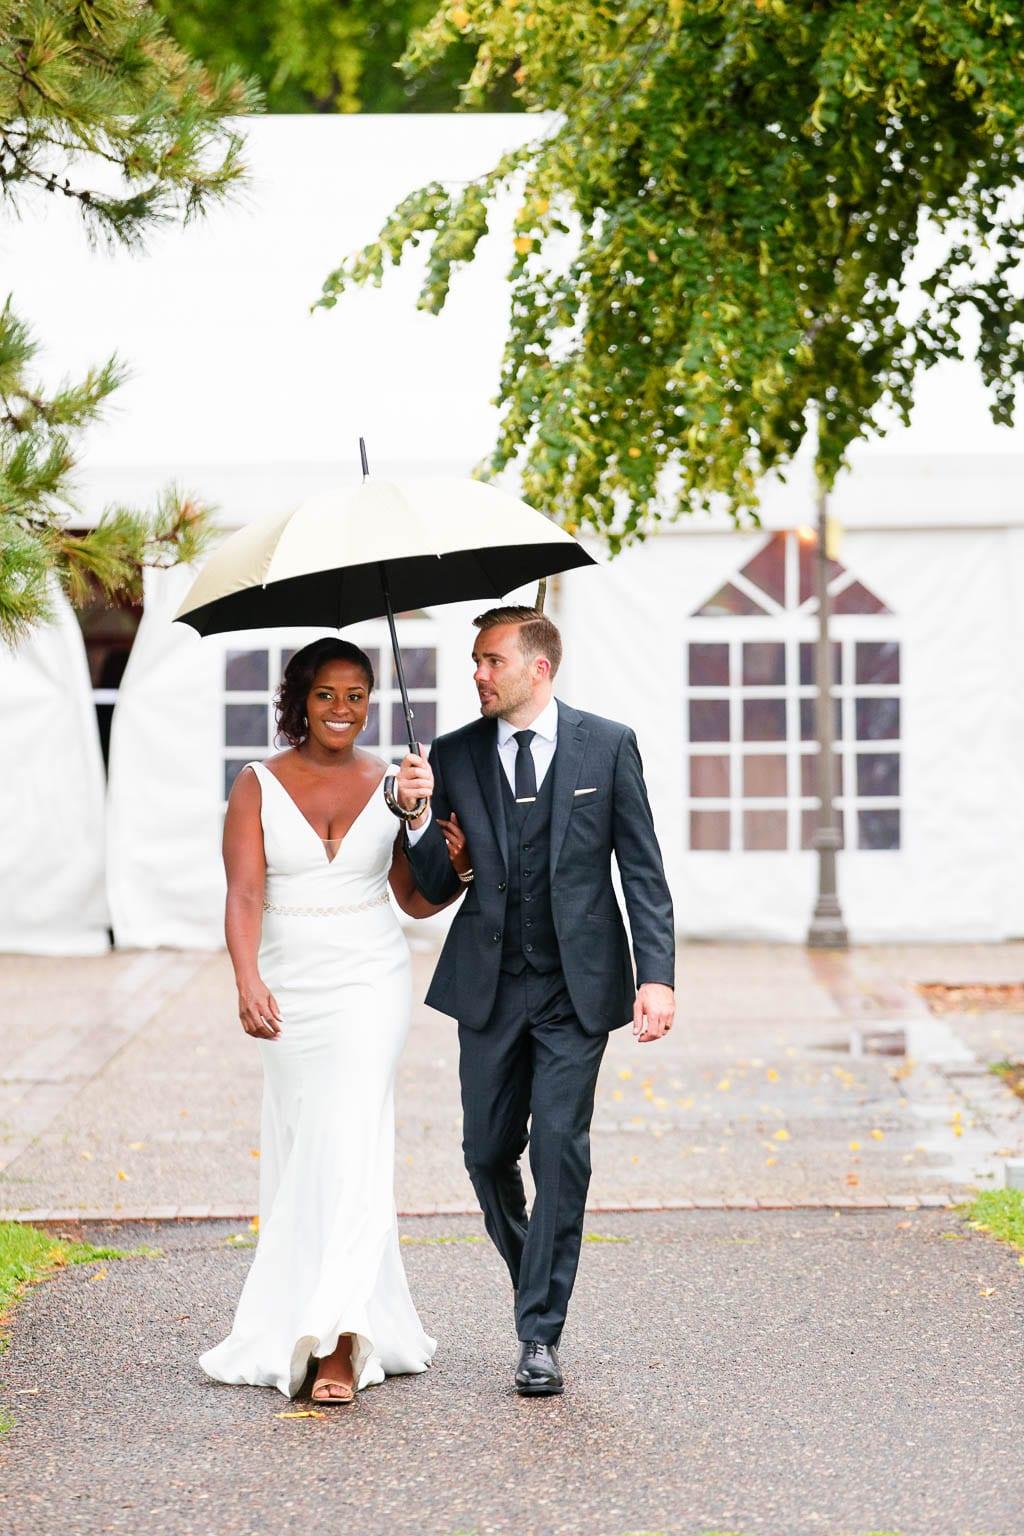 nicollet pavilion wedding 29